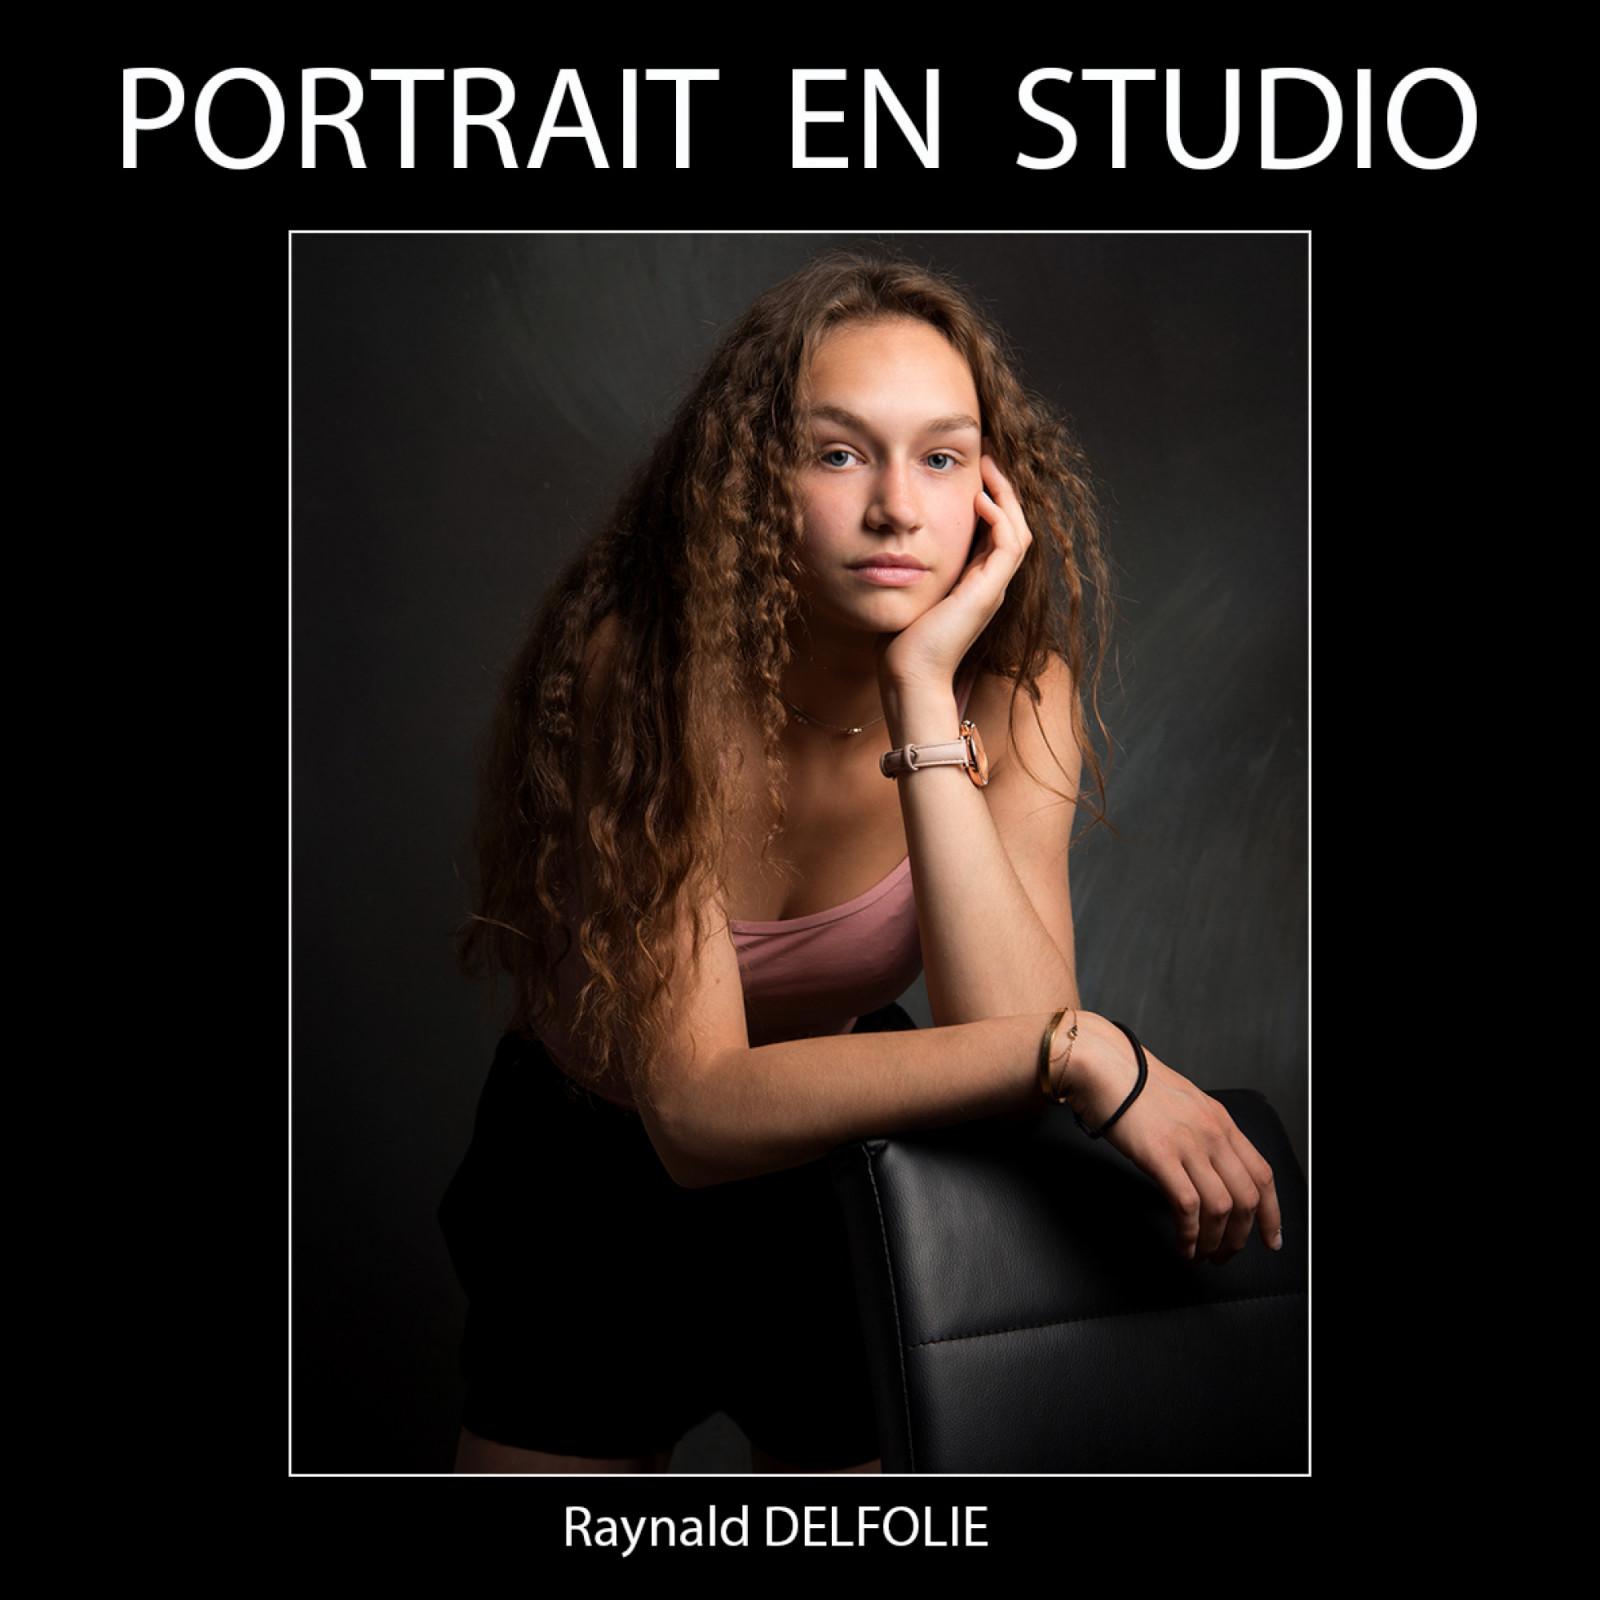 raynald-delfolie f2174db33abd